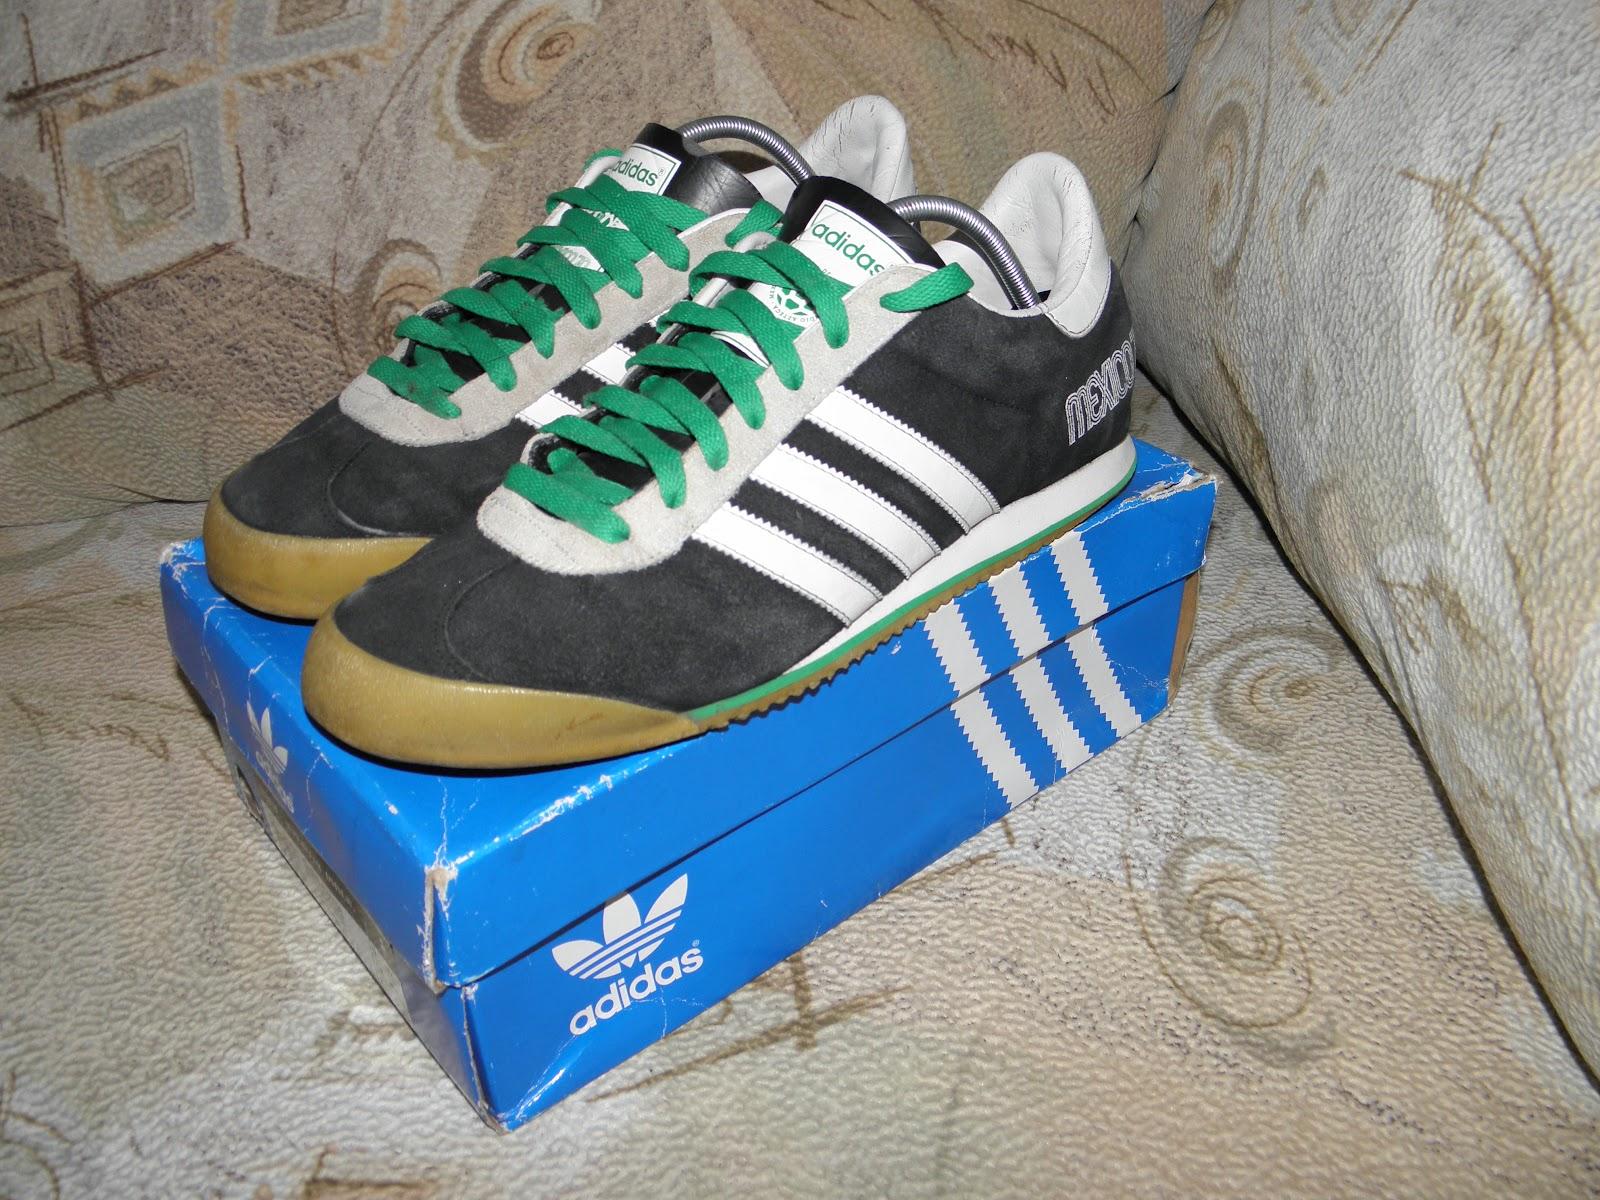 Puede ser calculado Complacer Suavemente  Sokolov Shop: Adidas Mexico70